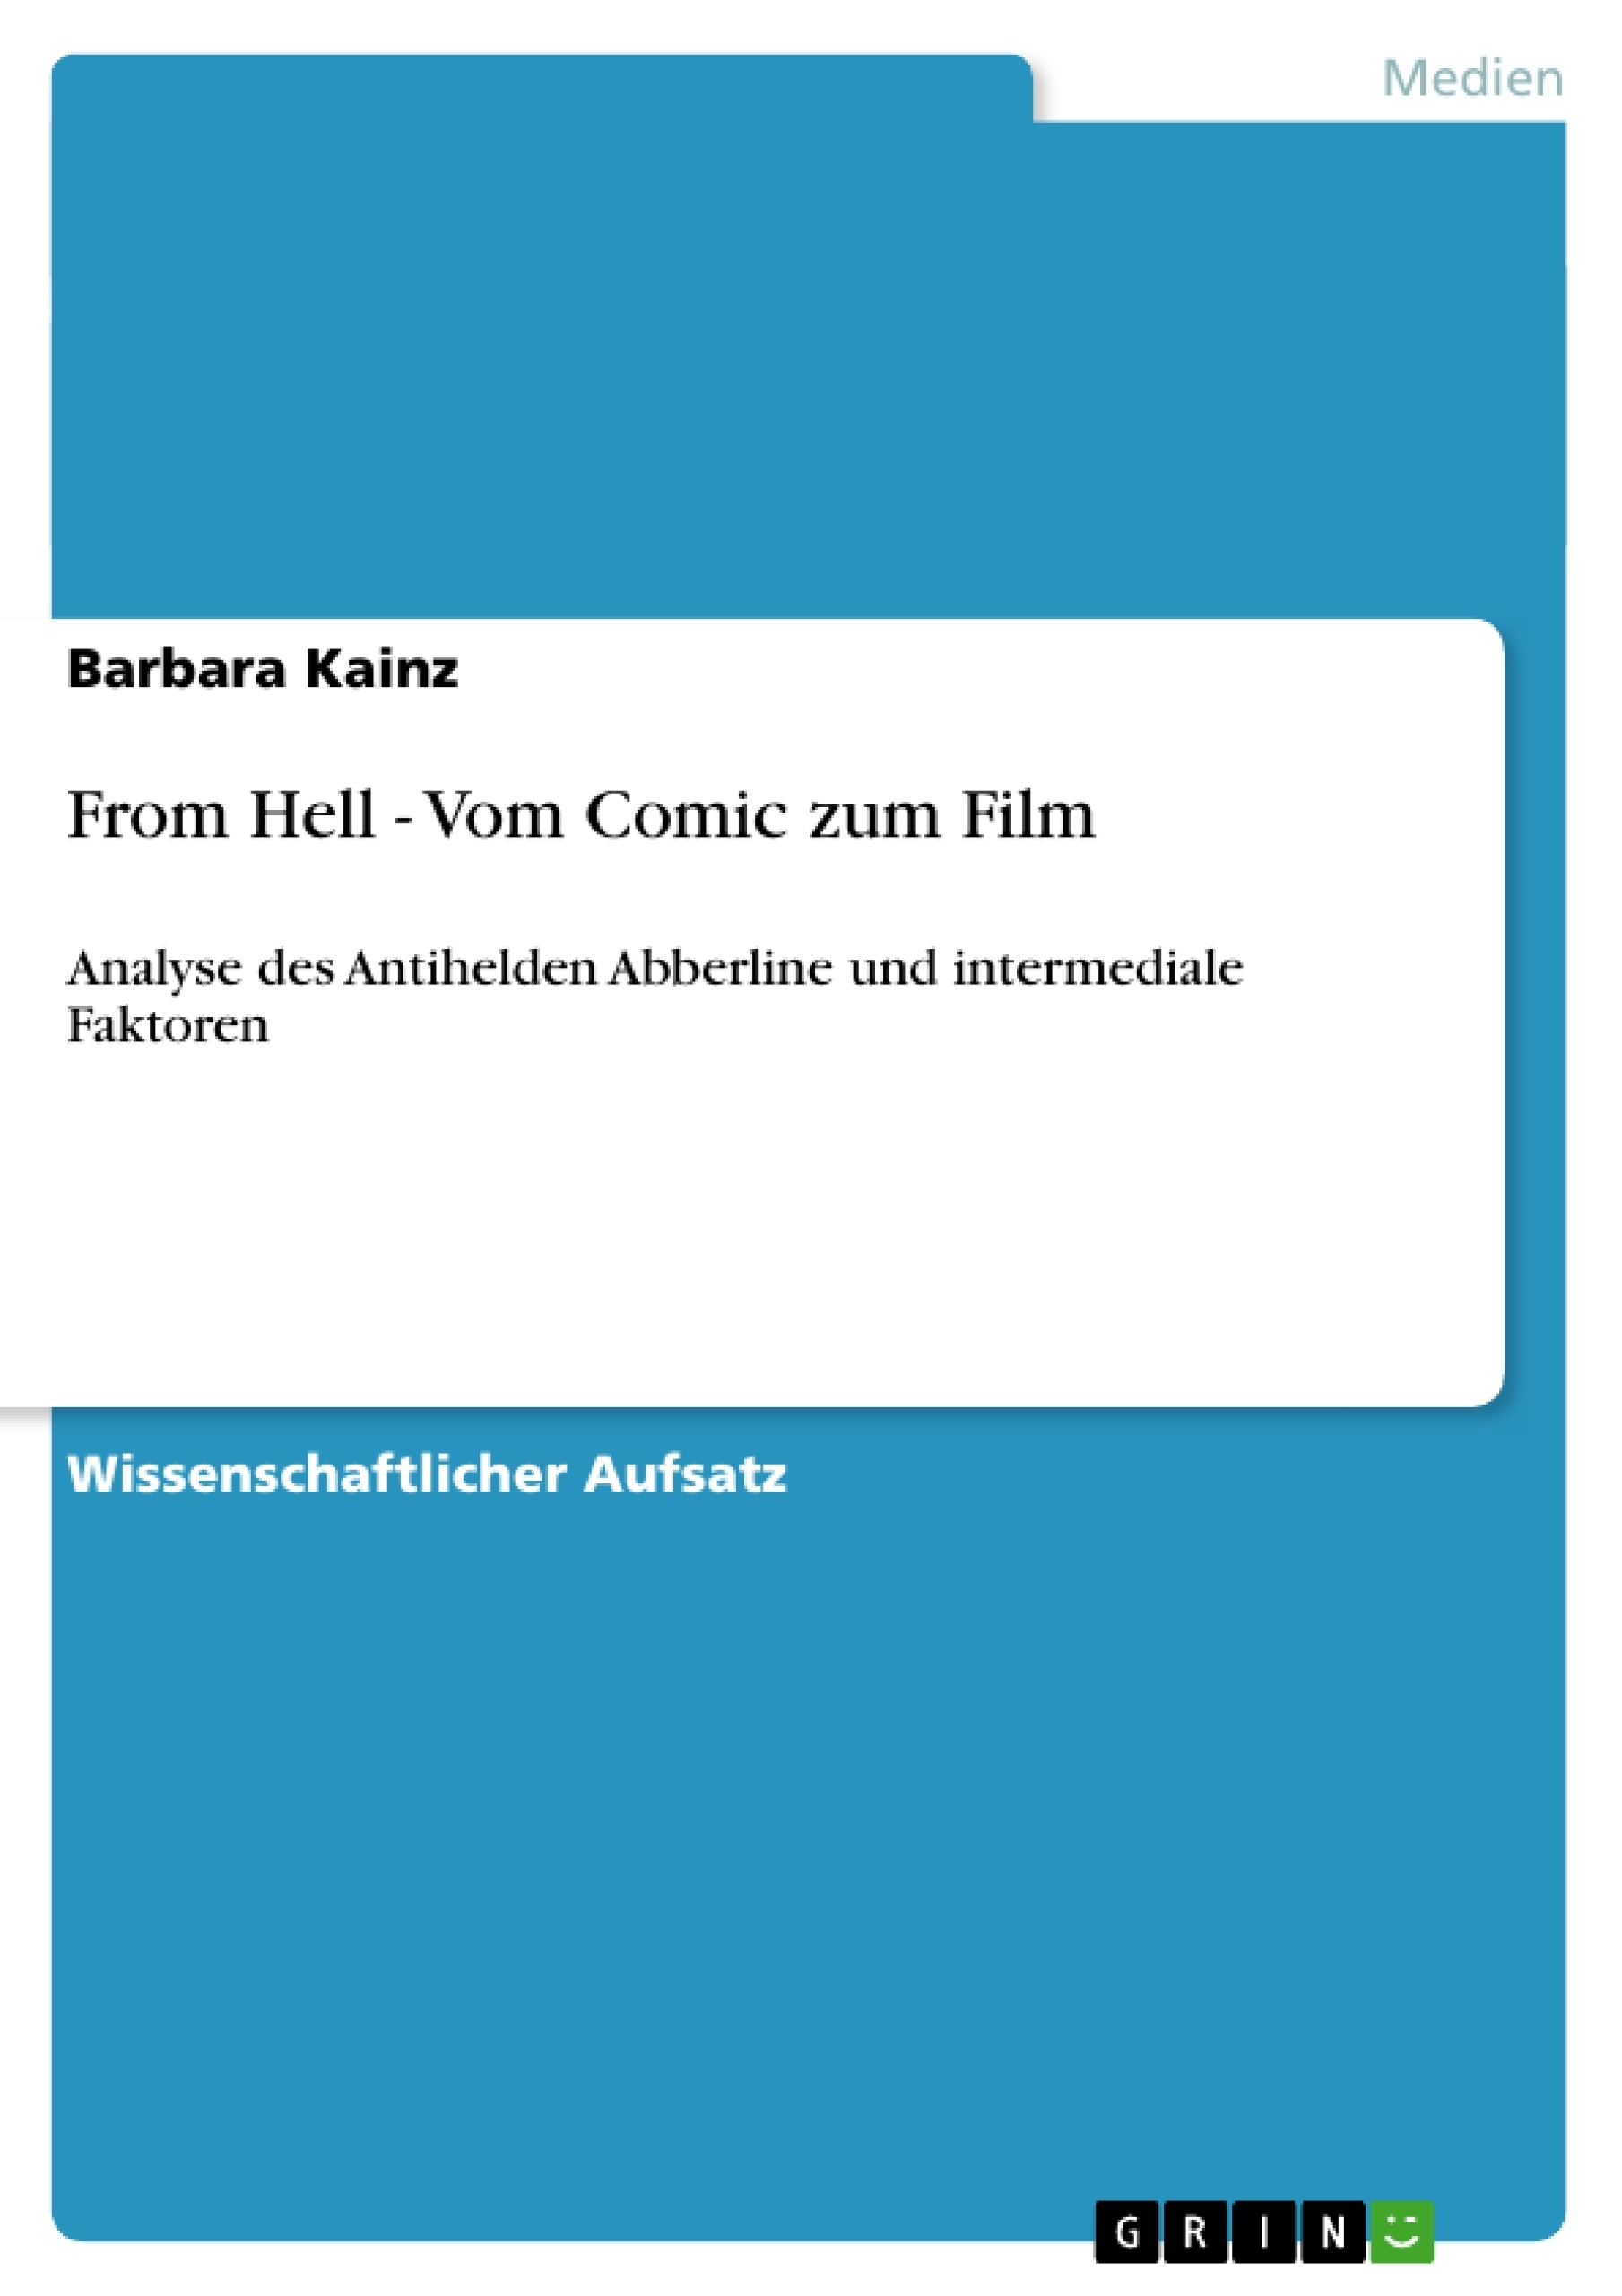 Titel: From Hell - Vom Comic zum Film